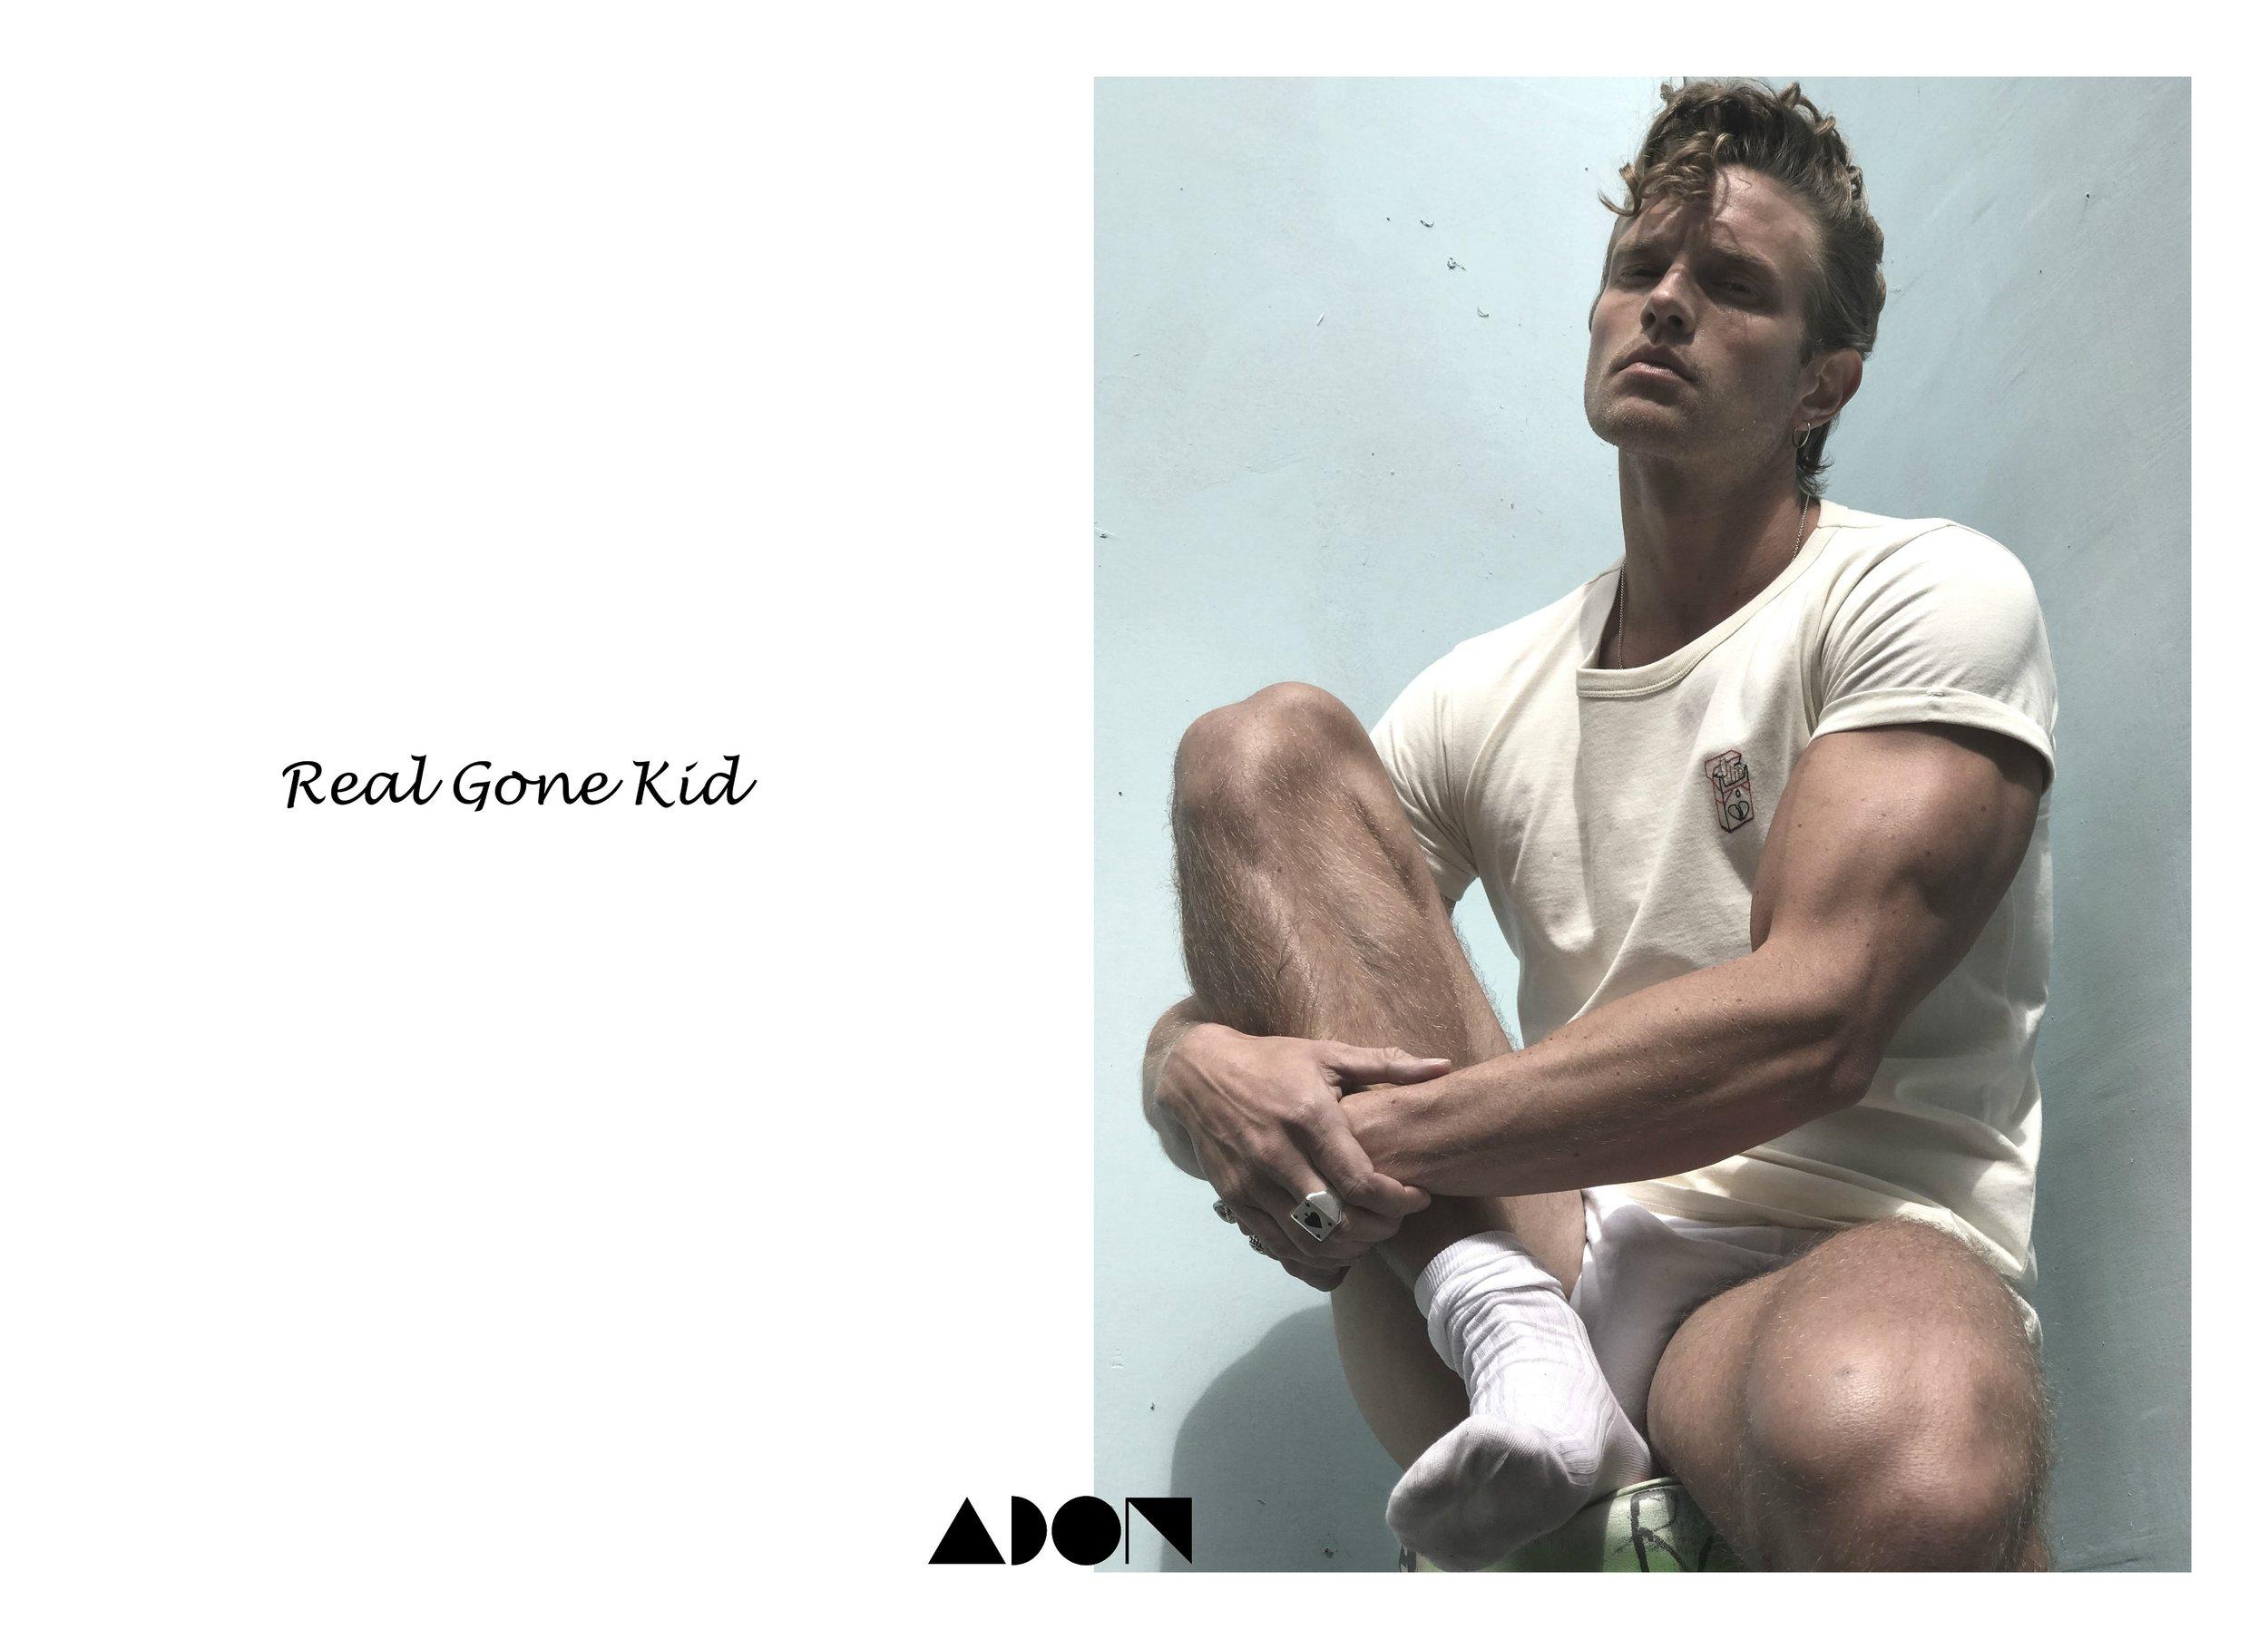 adon magazin- real gone kid 2018 (5).jpg